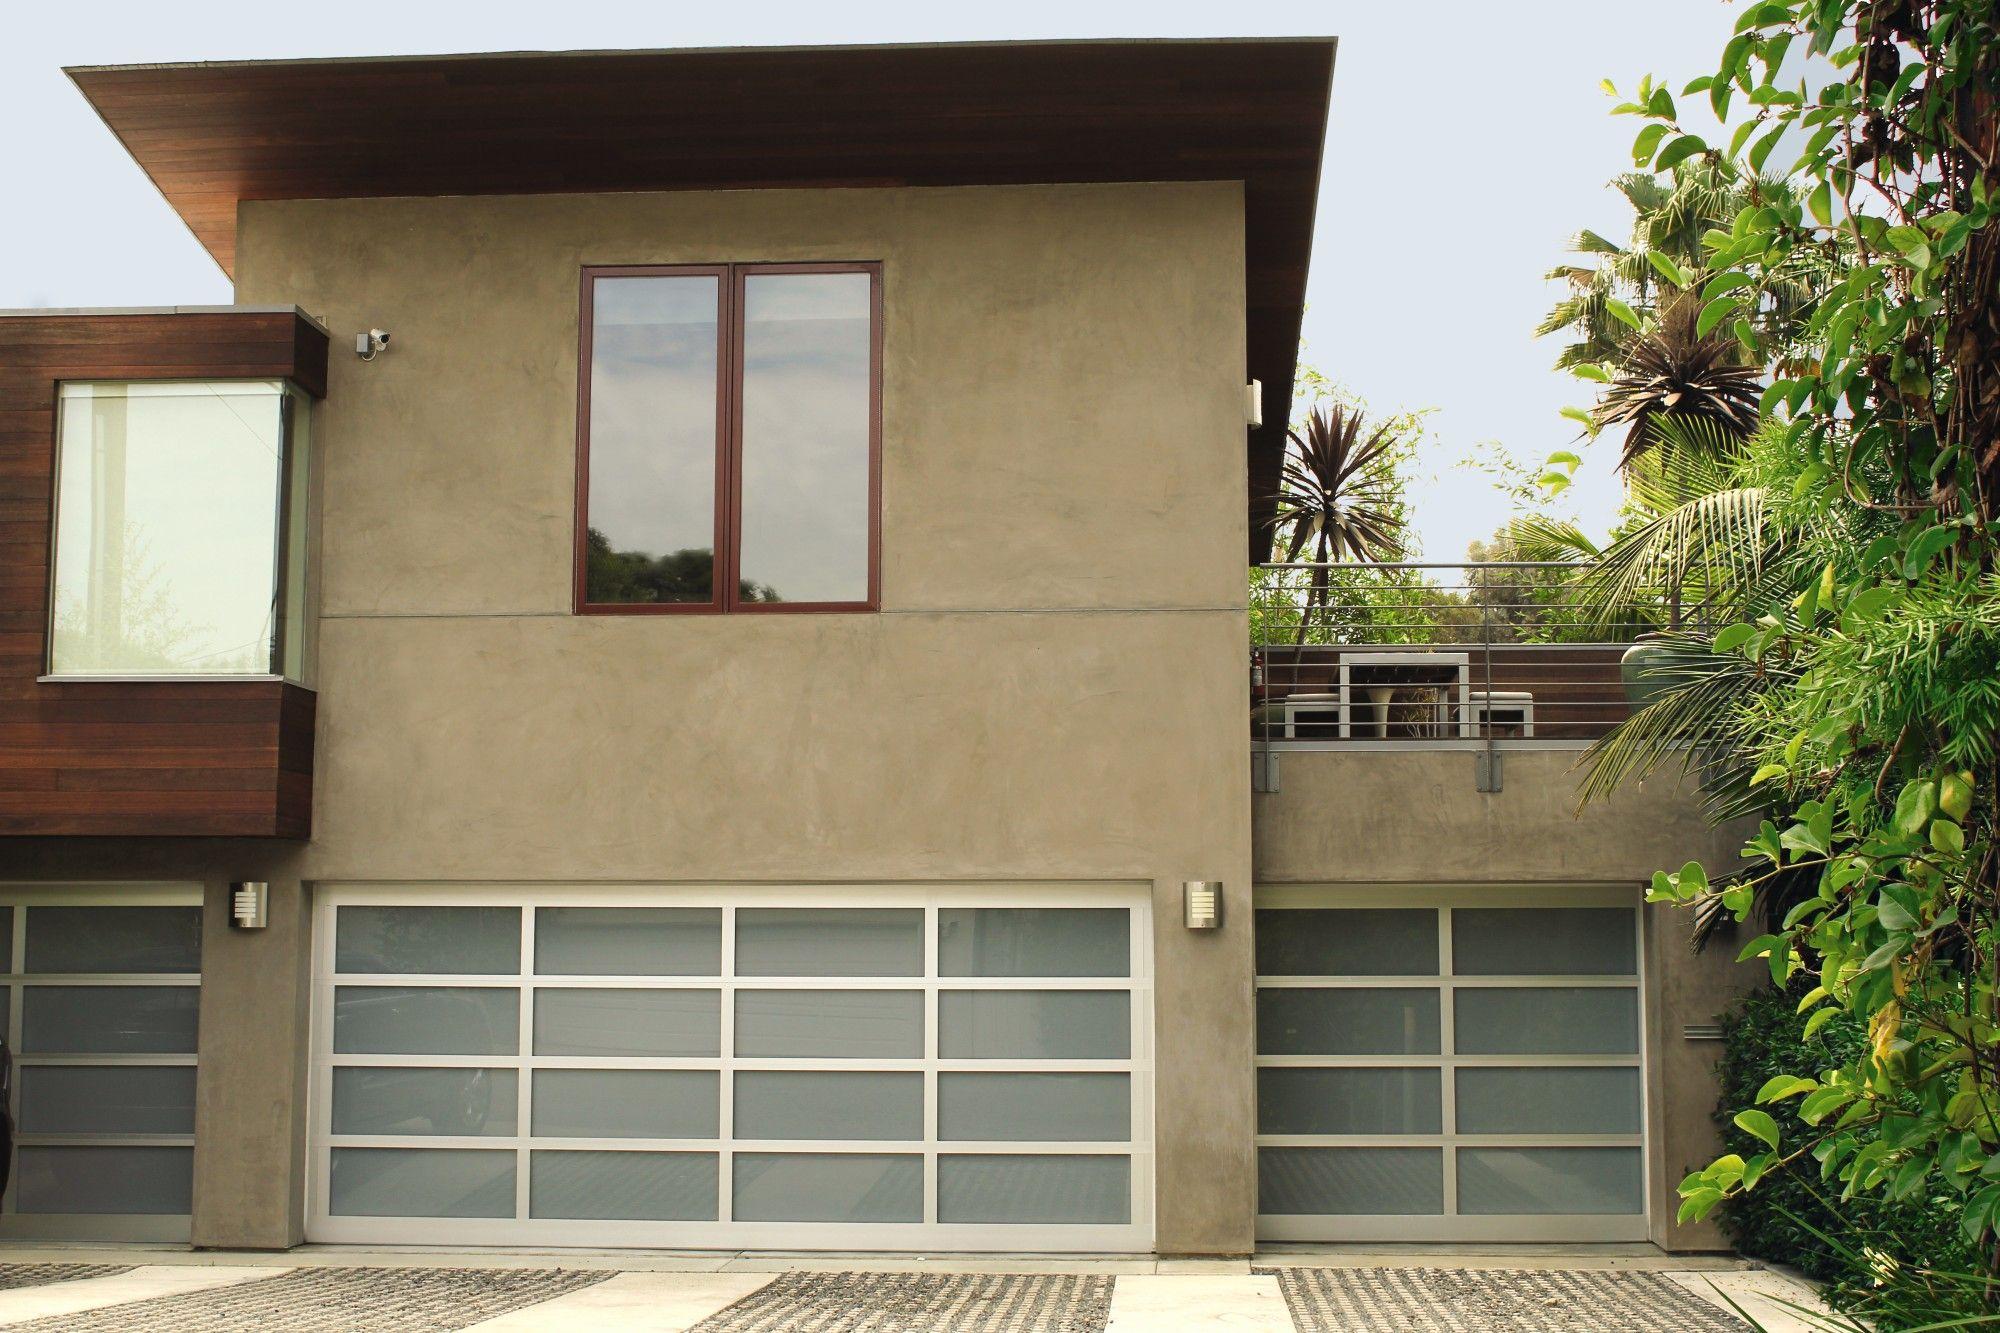 Glass aluminum garage door on this modern home Modern Home Design